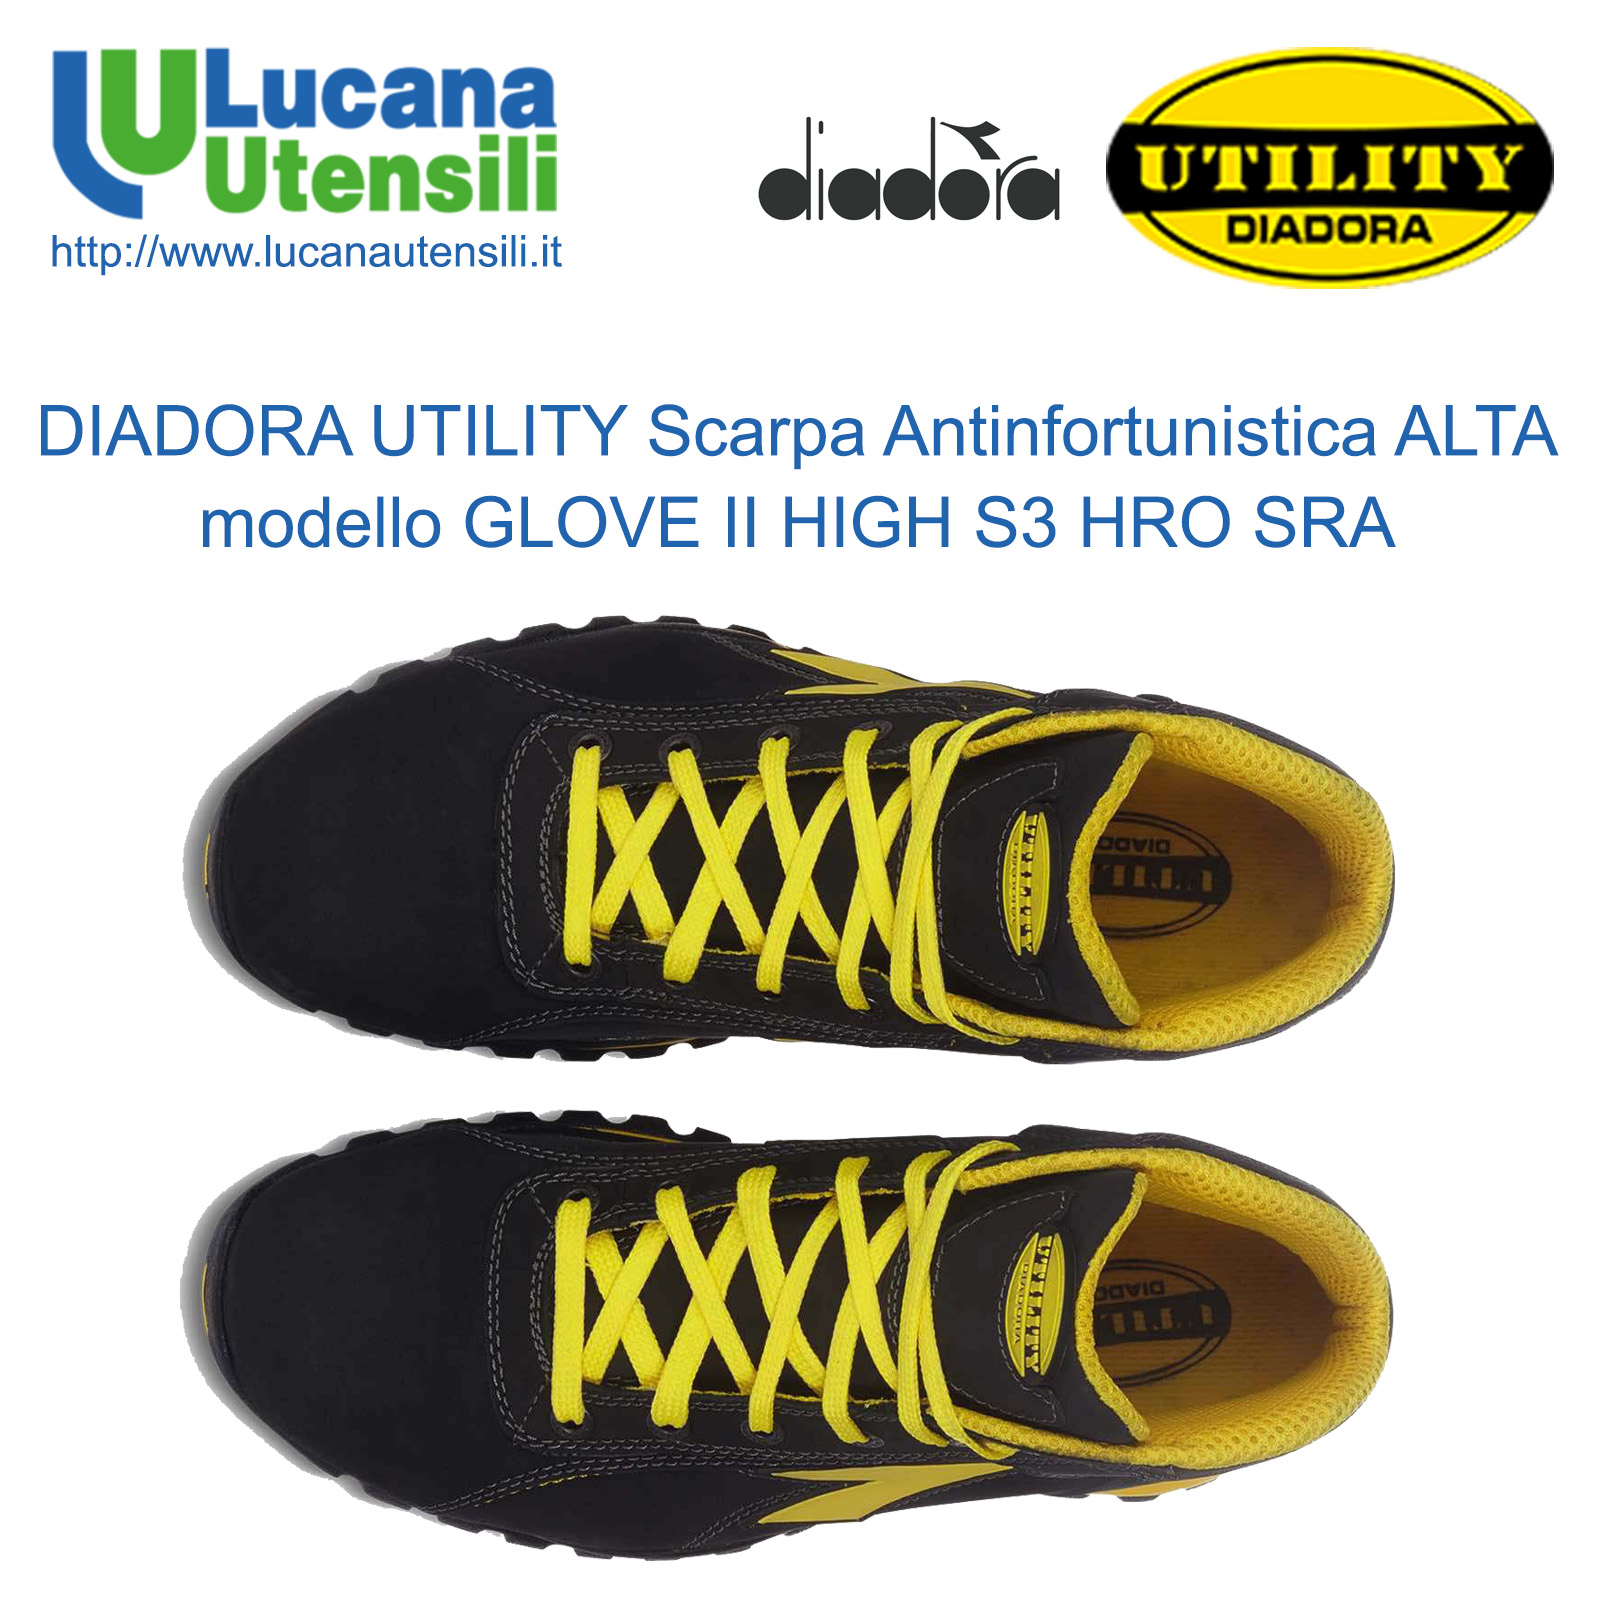 DIADORA UTILITY SCARPA ANTINFORTUNISTICA ALTA modello GLOVE II HIGH S3 ... fe52a4d2bd9